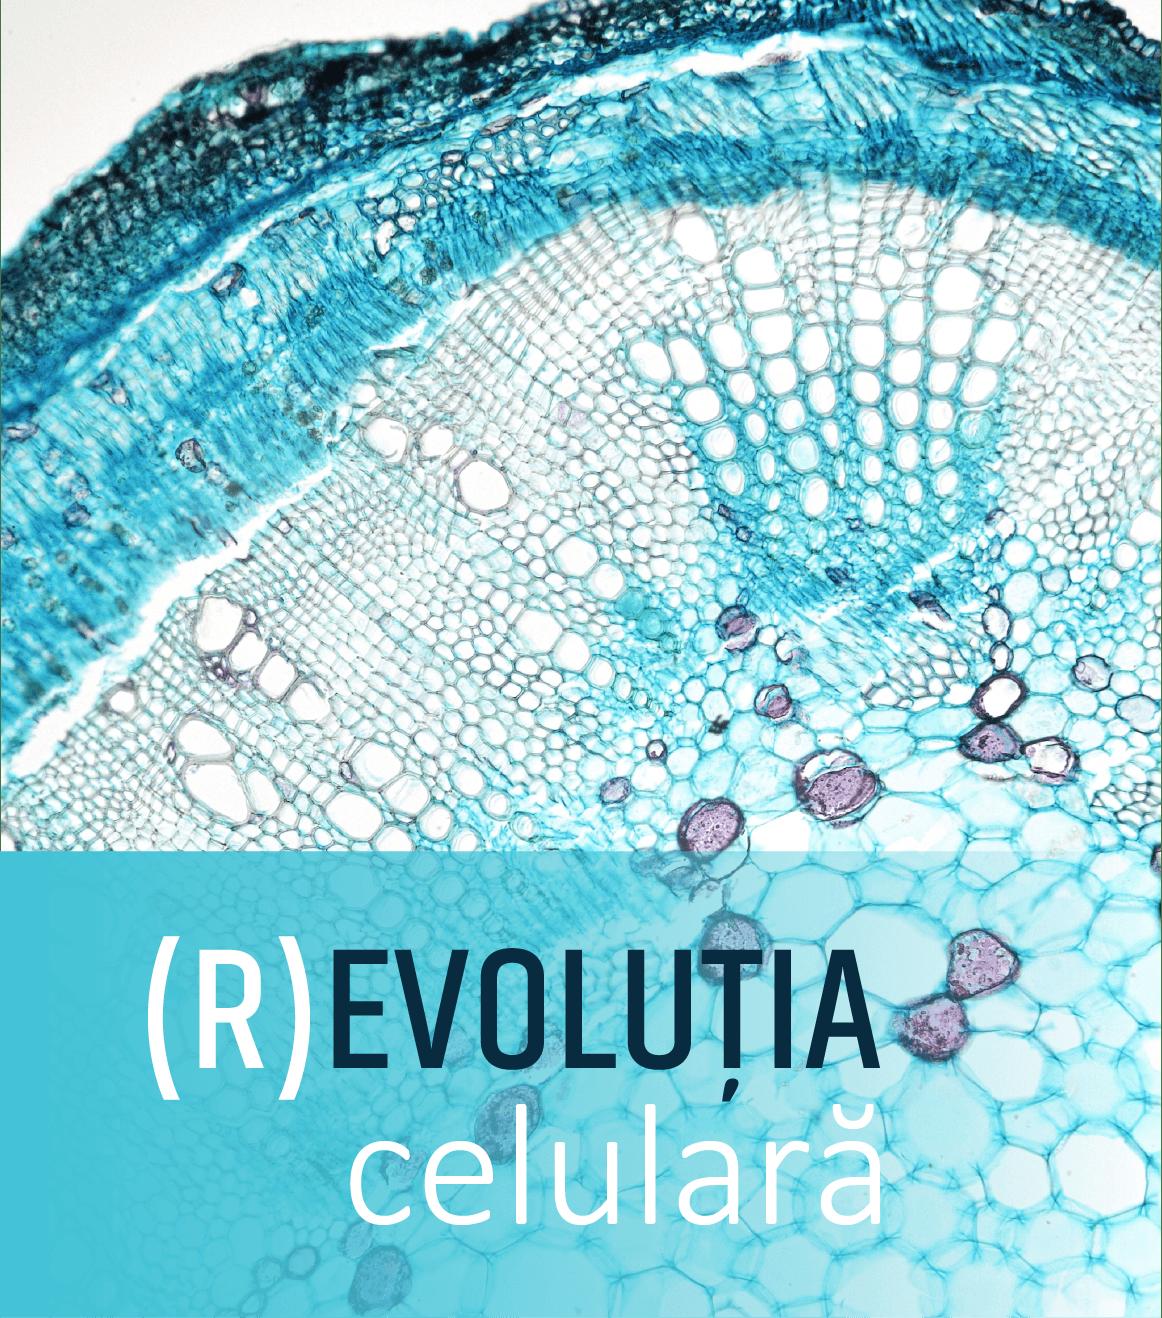 revolutia_celulara-1.png